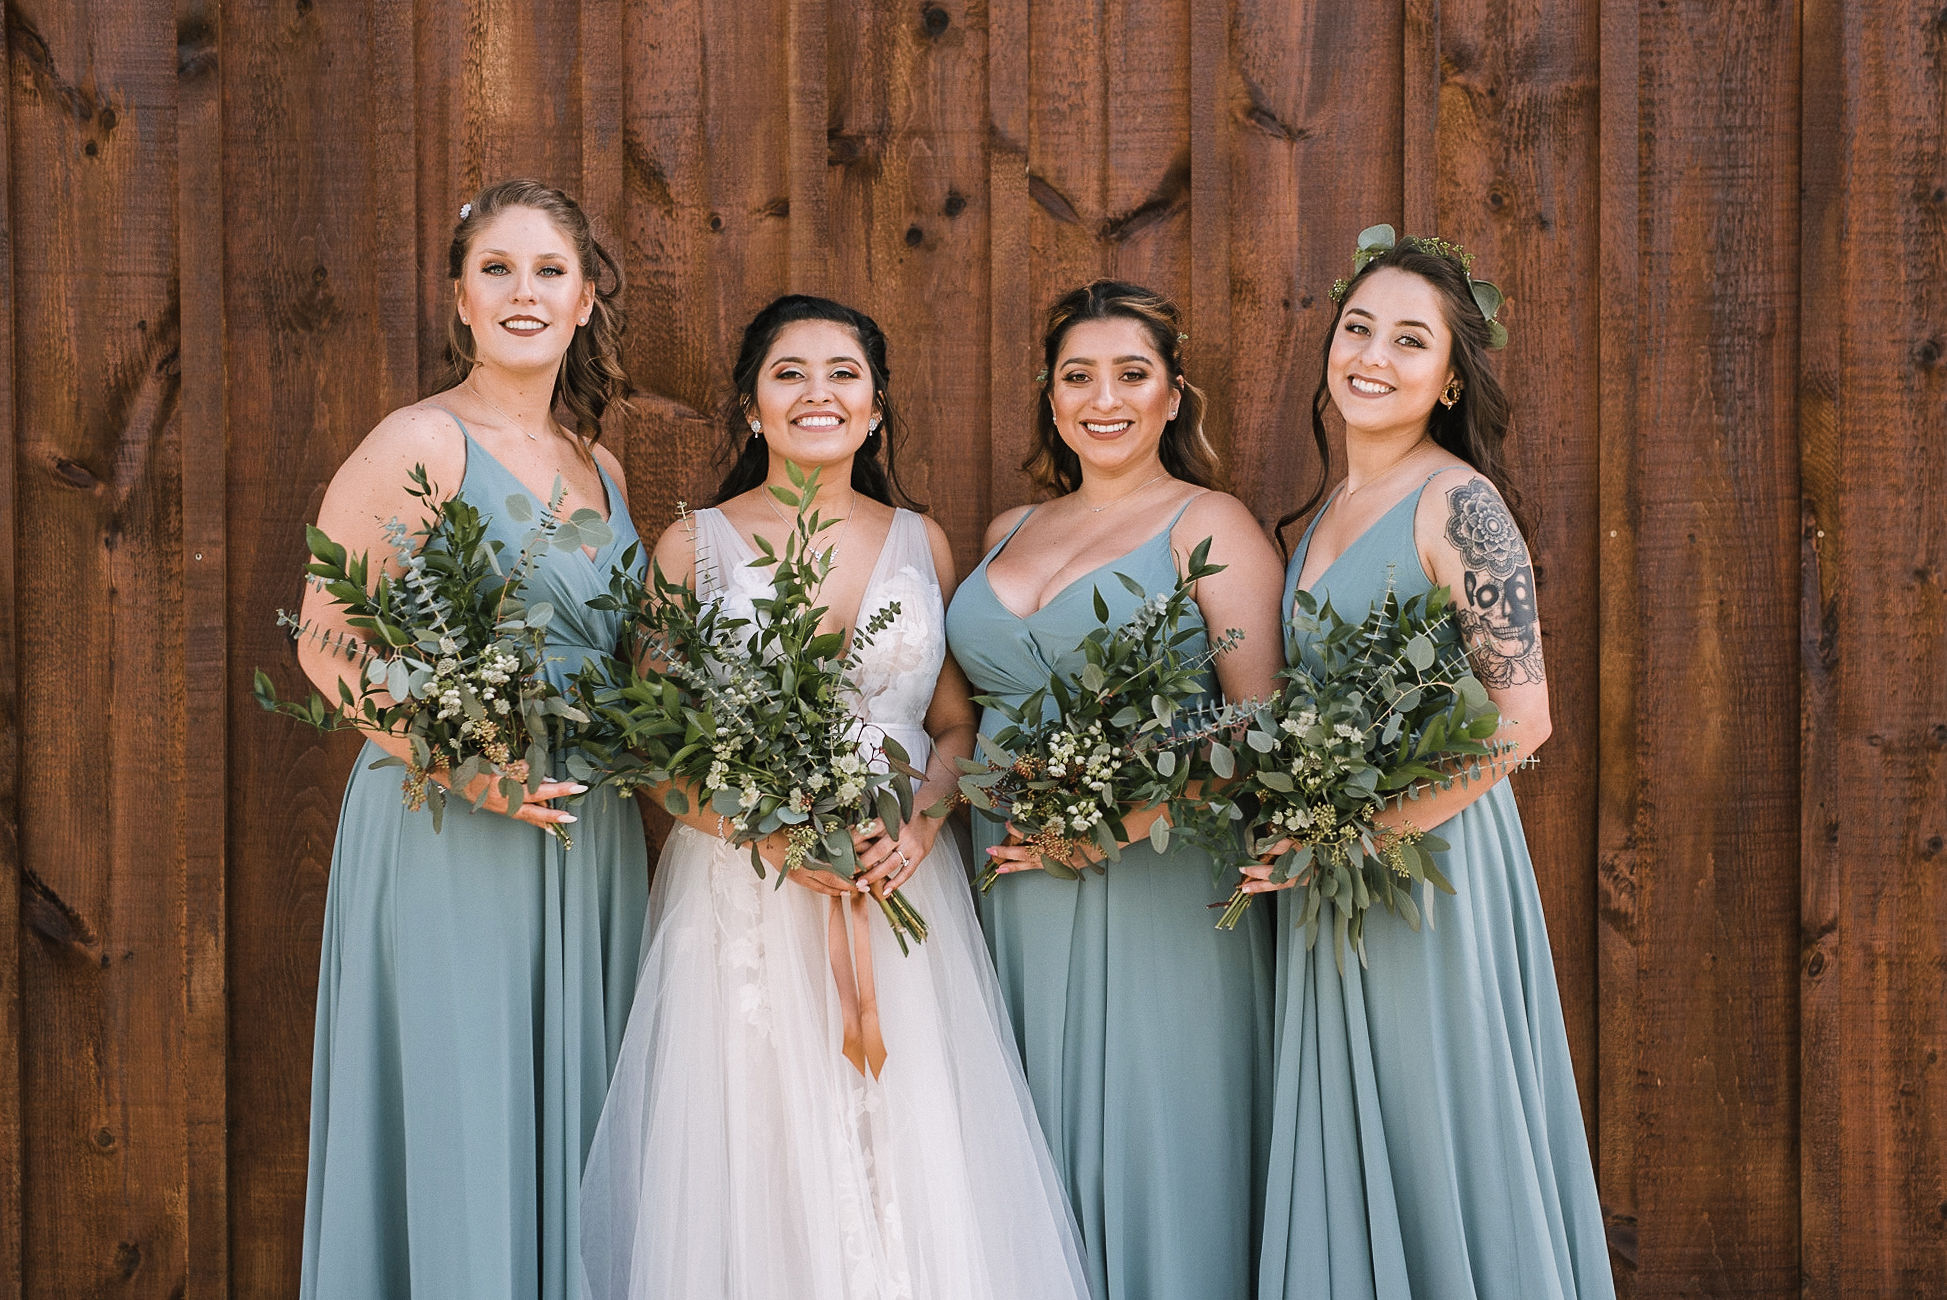 bride and bridesmaids smiling at the Faithbrooke Barn & Vineyards